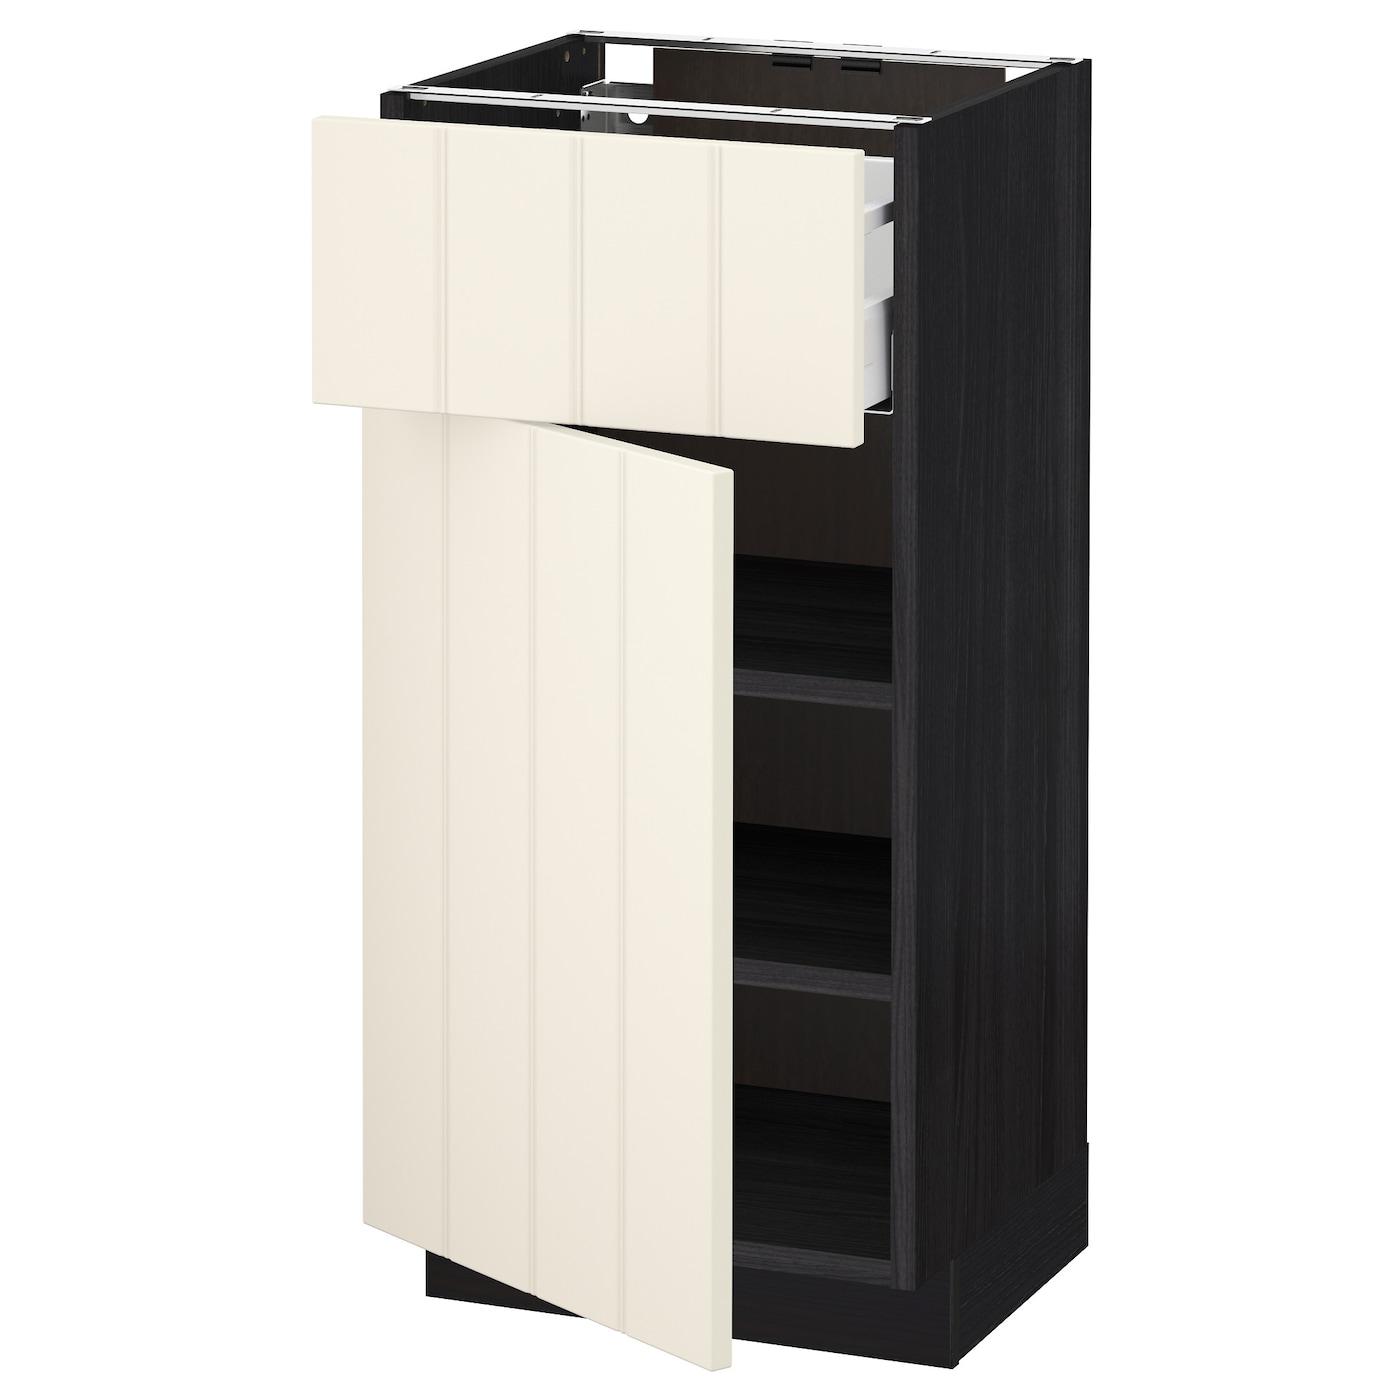 metod maximera base cabinet with drawer door black hittarp off white 40 x 37 cm ikea. Black Bedroom Furniture Sets. Home Design Ideas